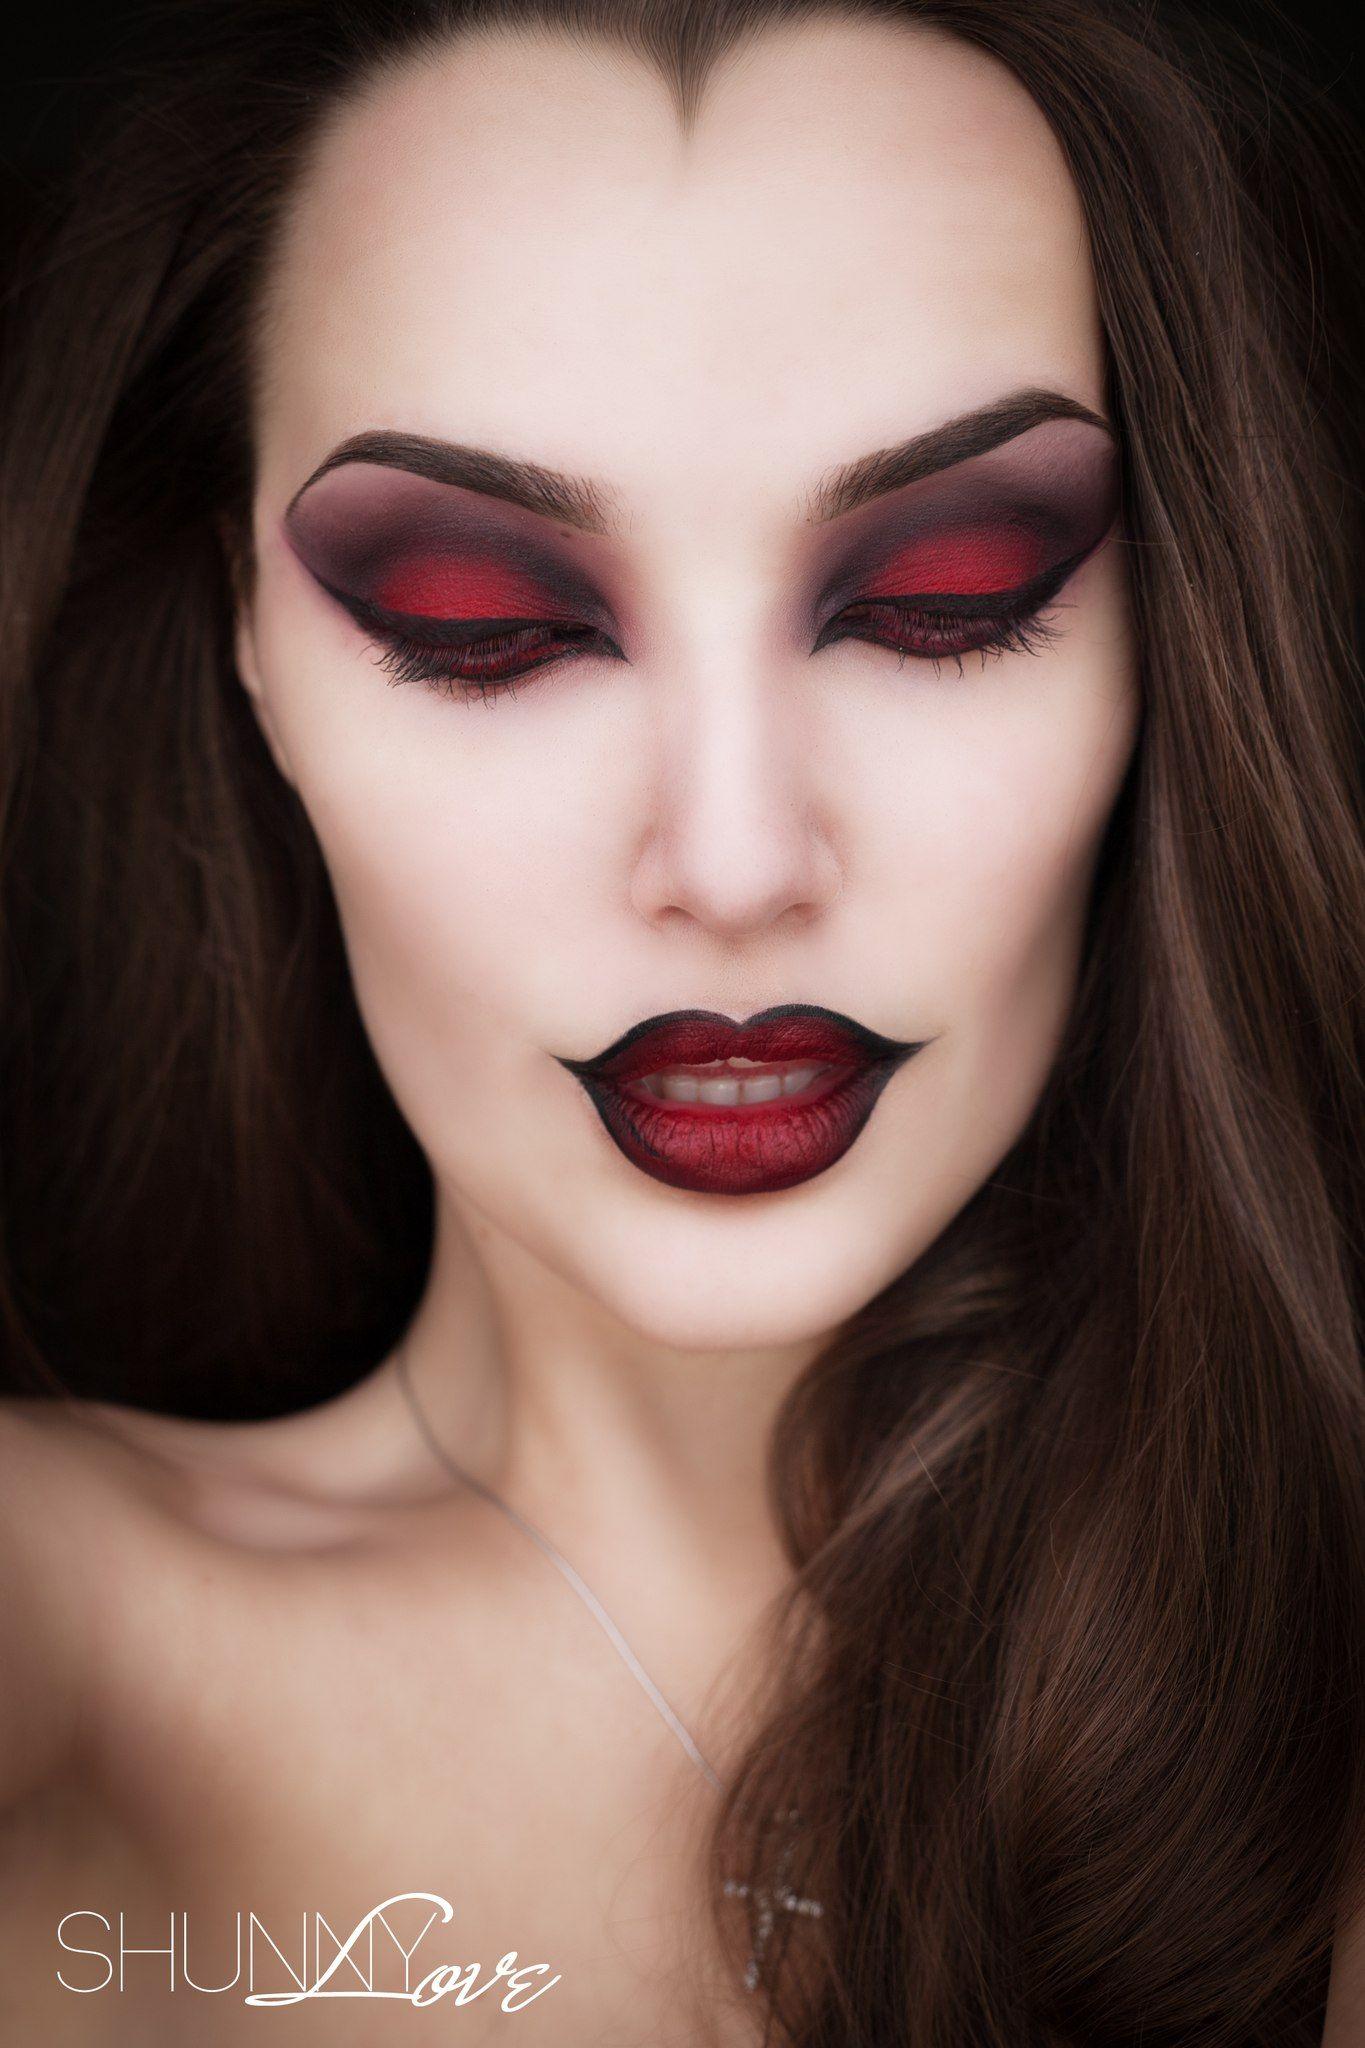 27 Terrifyingly Fun Halloween Makeup Ideas You'll Love